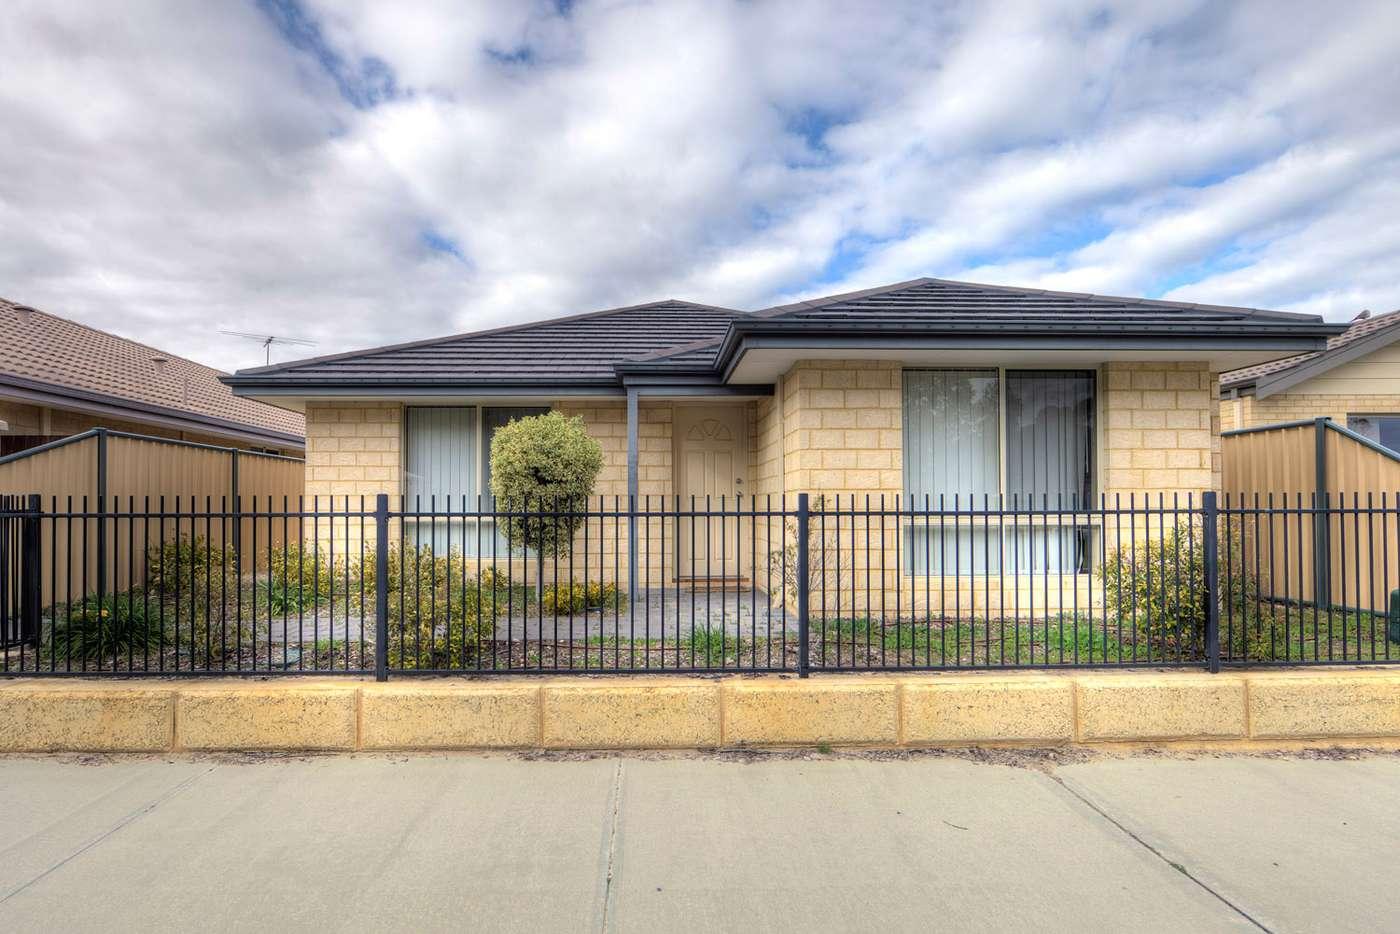 Main view of Homely house listing, 4 Kalbarri Avenue, Yanchep WA 6035